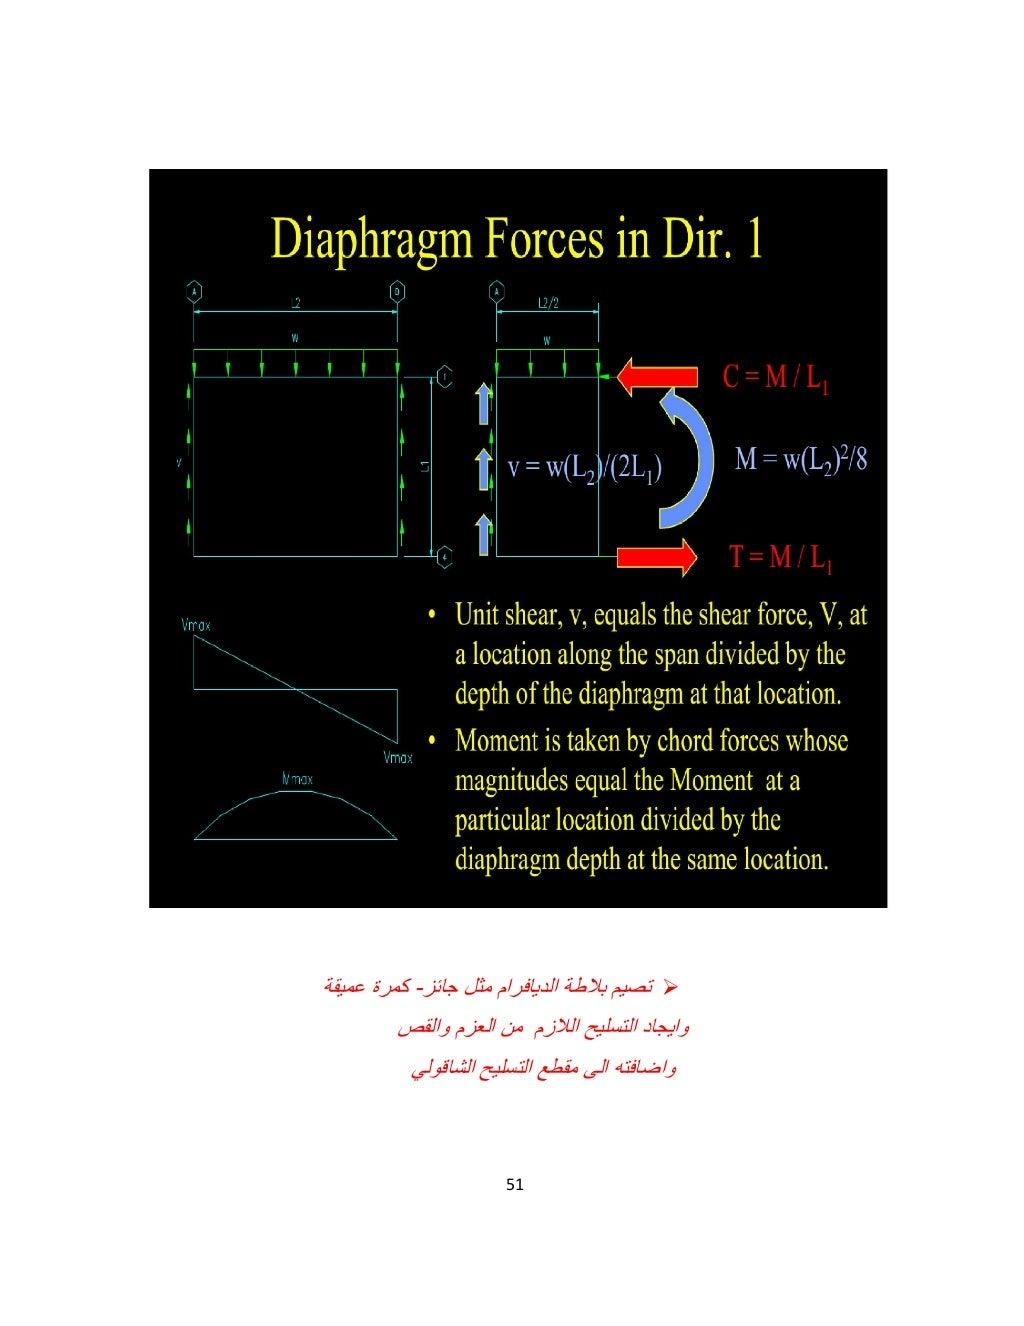 rigid-semi-rigid-flexible-diaphragm-for-seismic-analysis-51-1024.jpg